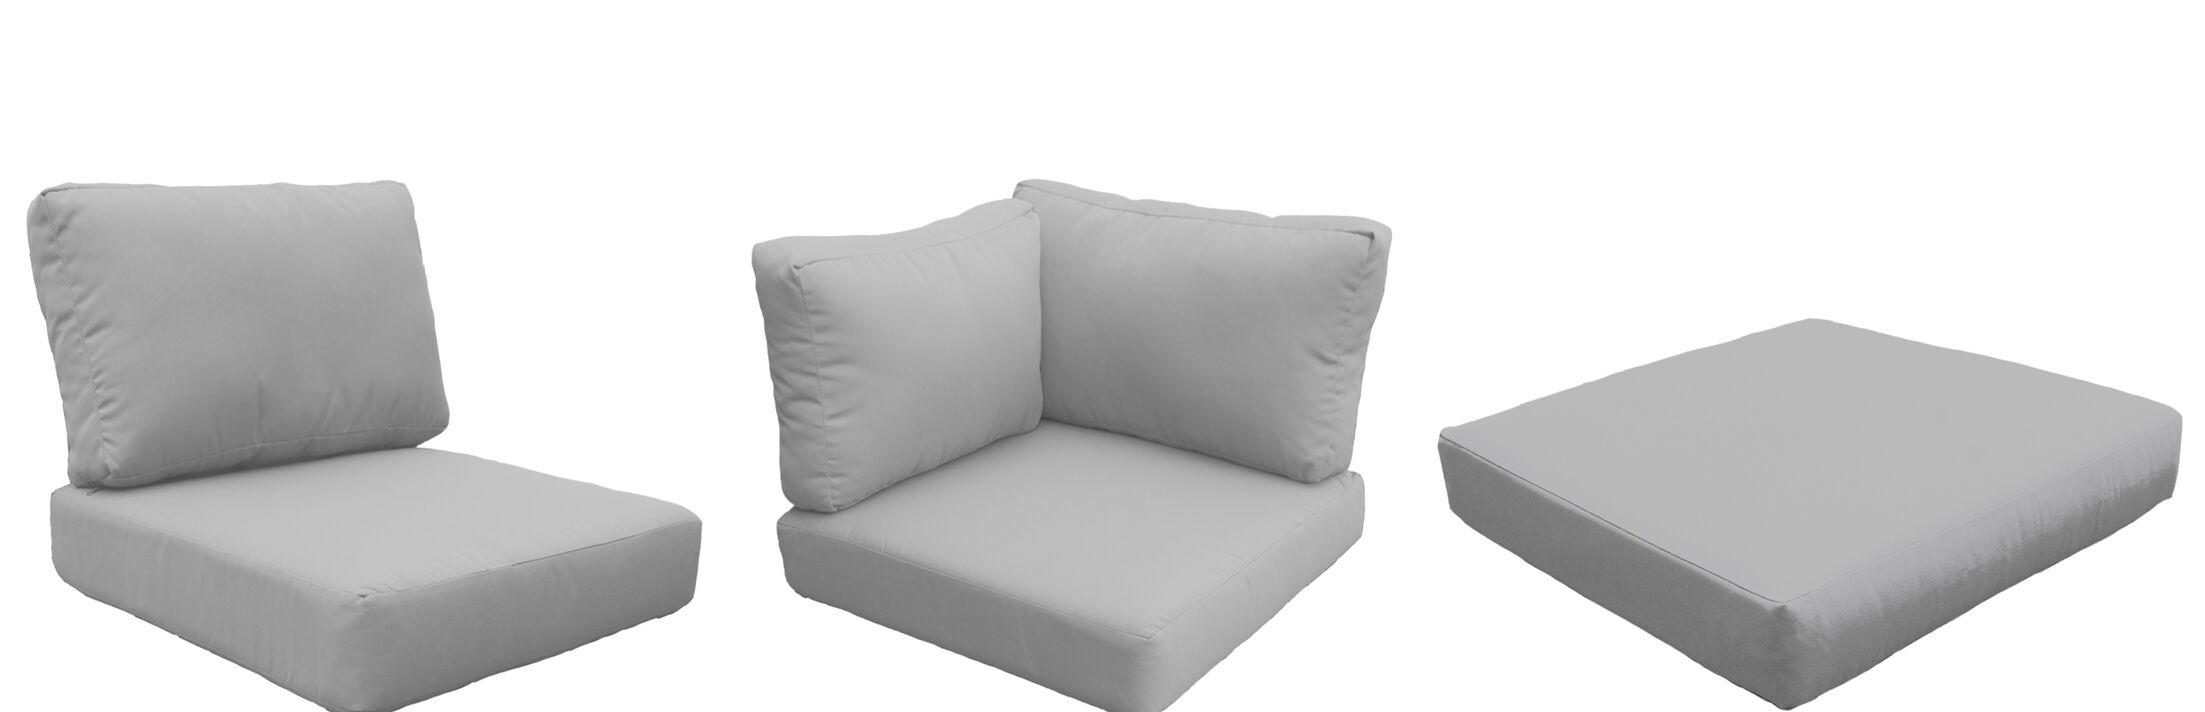 Barbados 18 Piece Outdoor Cushion Set Fabric: Gray